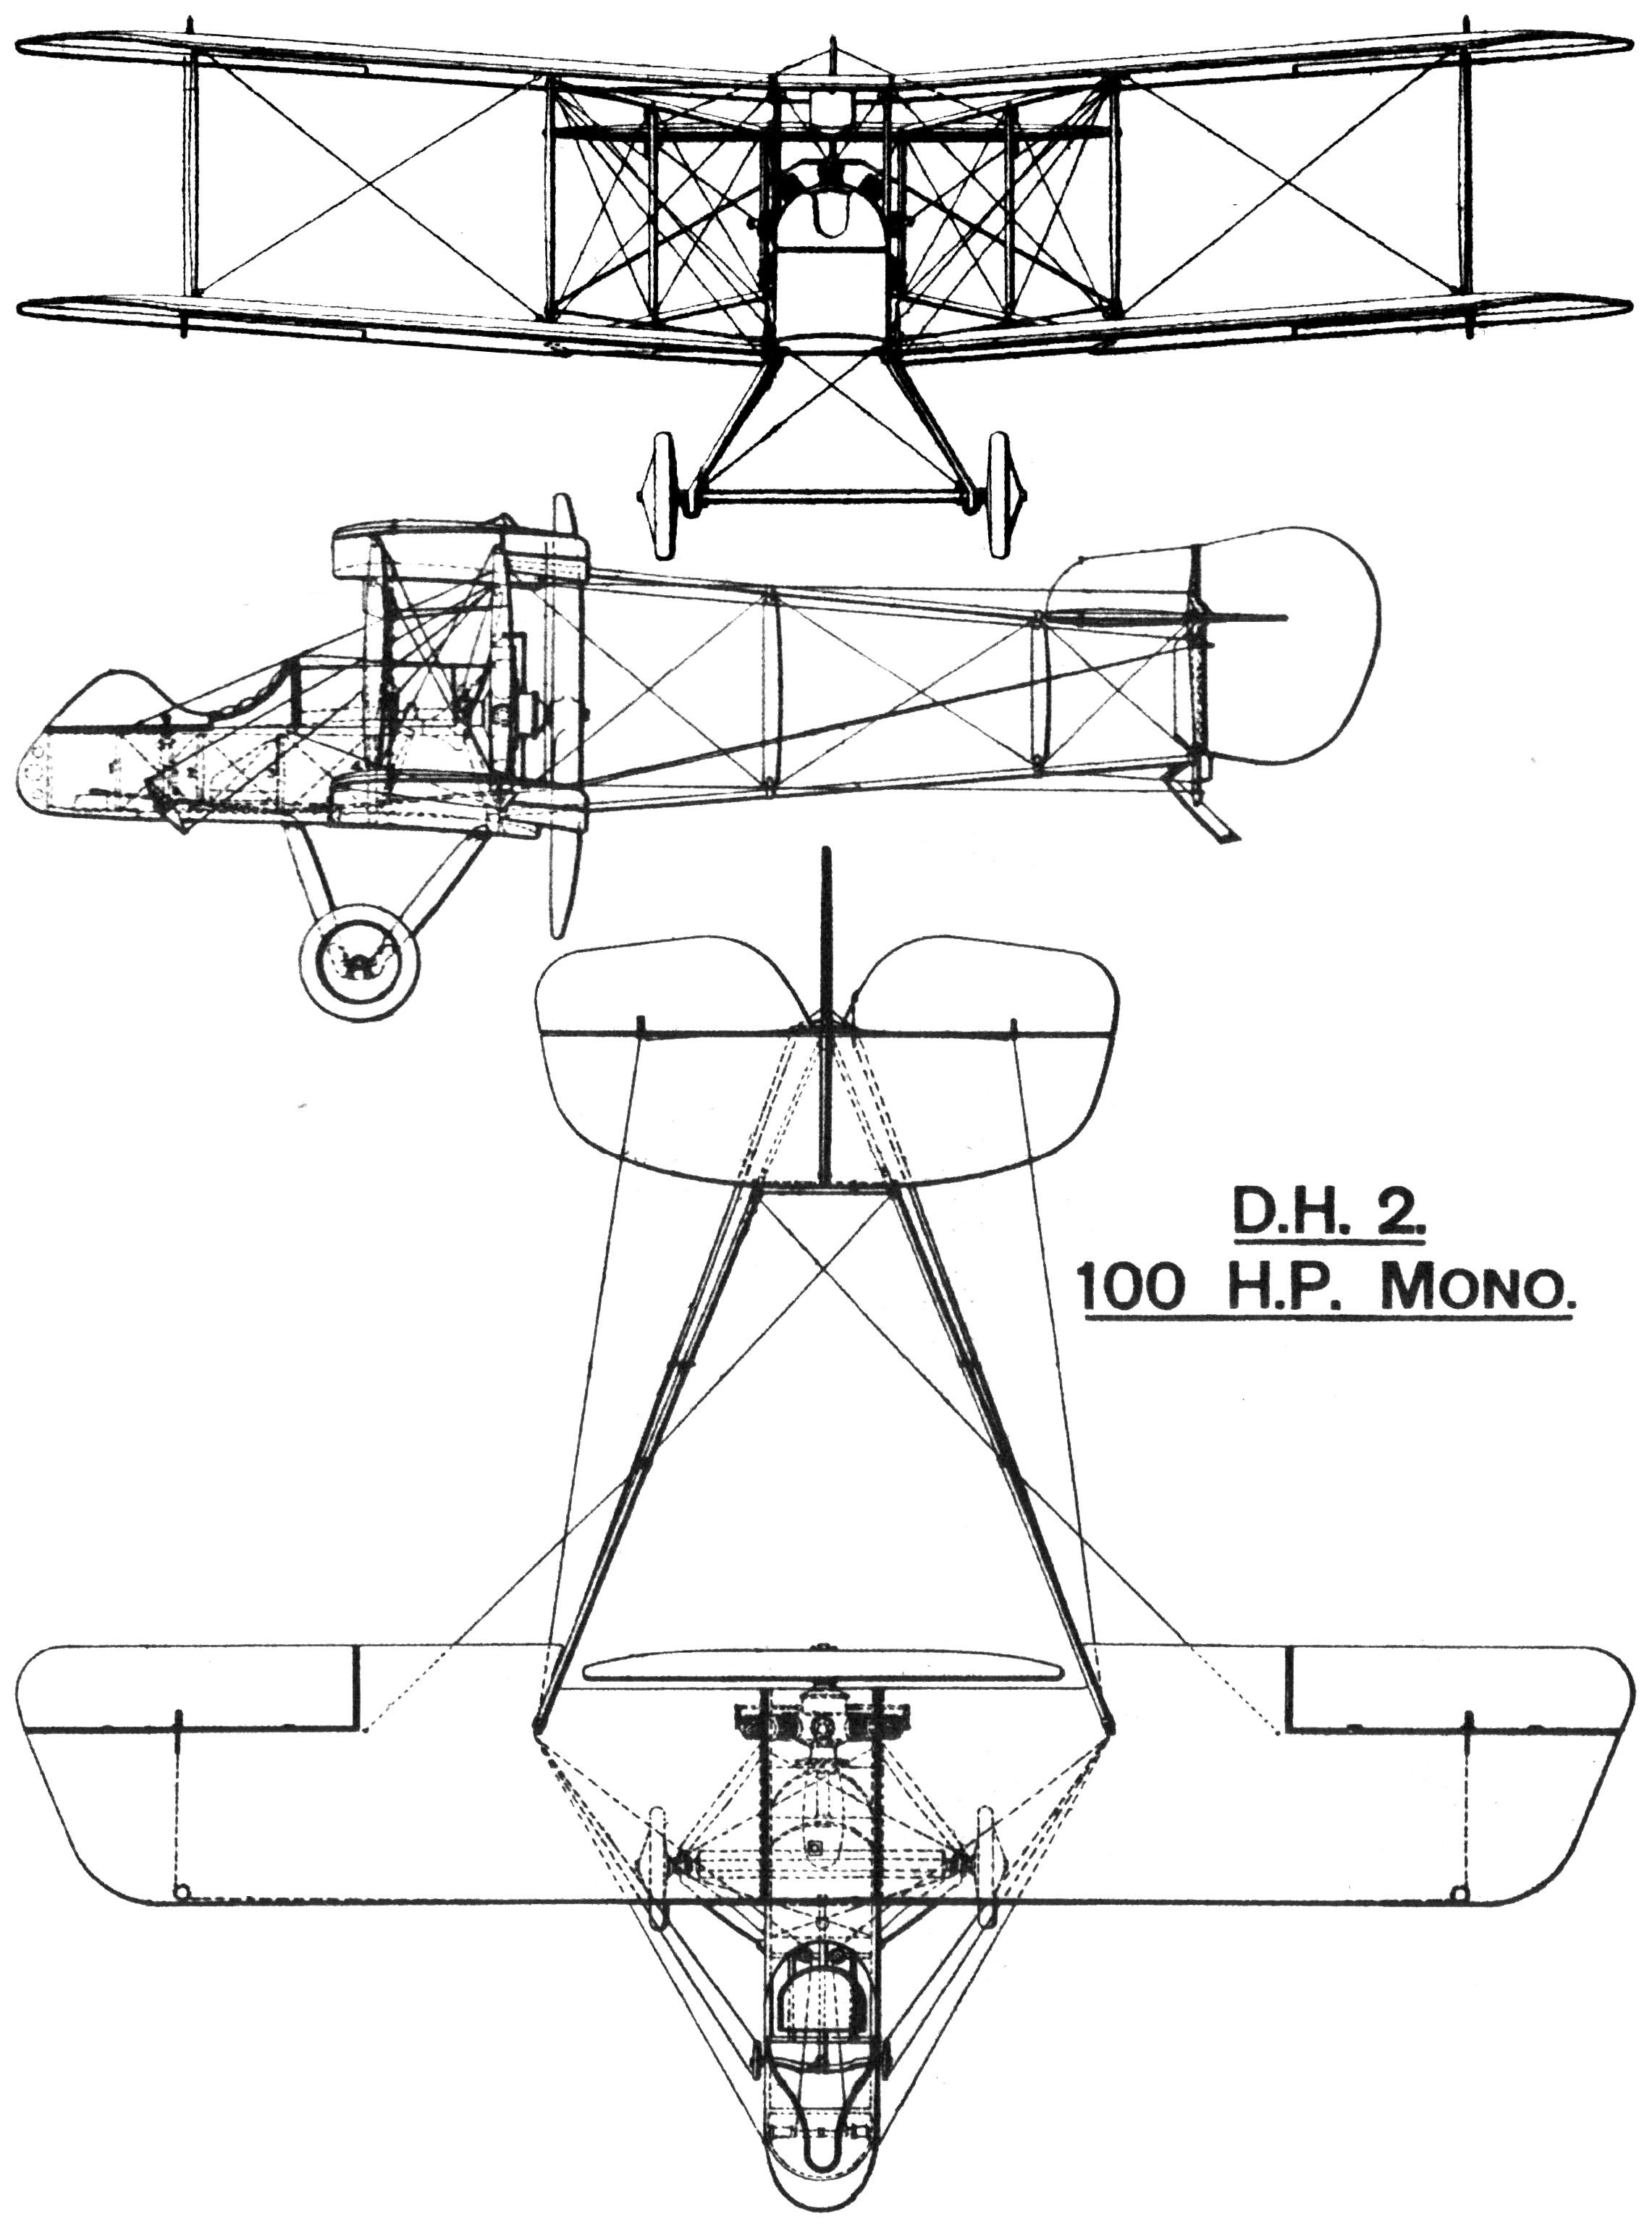 Fil Airco D H 2 British First World War Single Seat